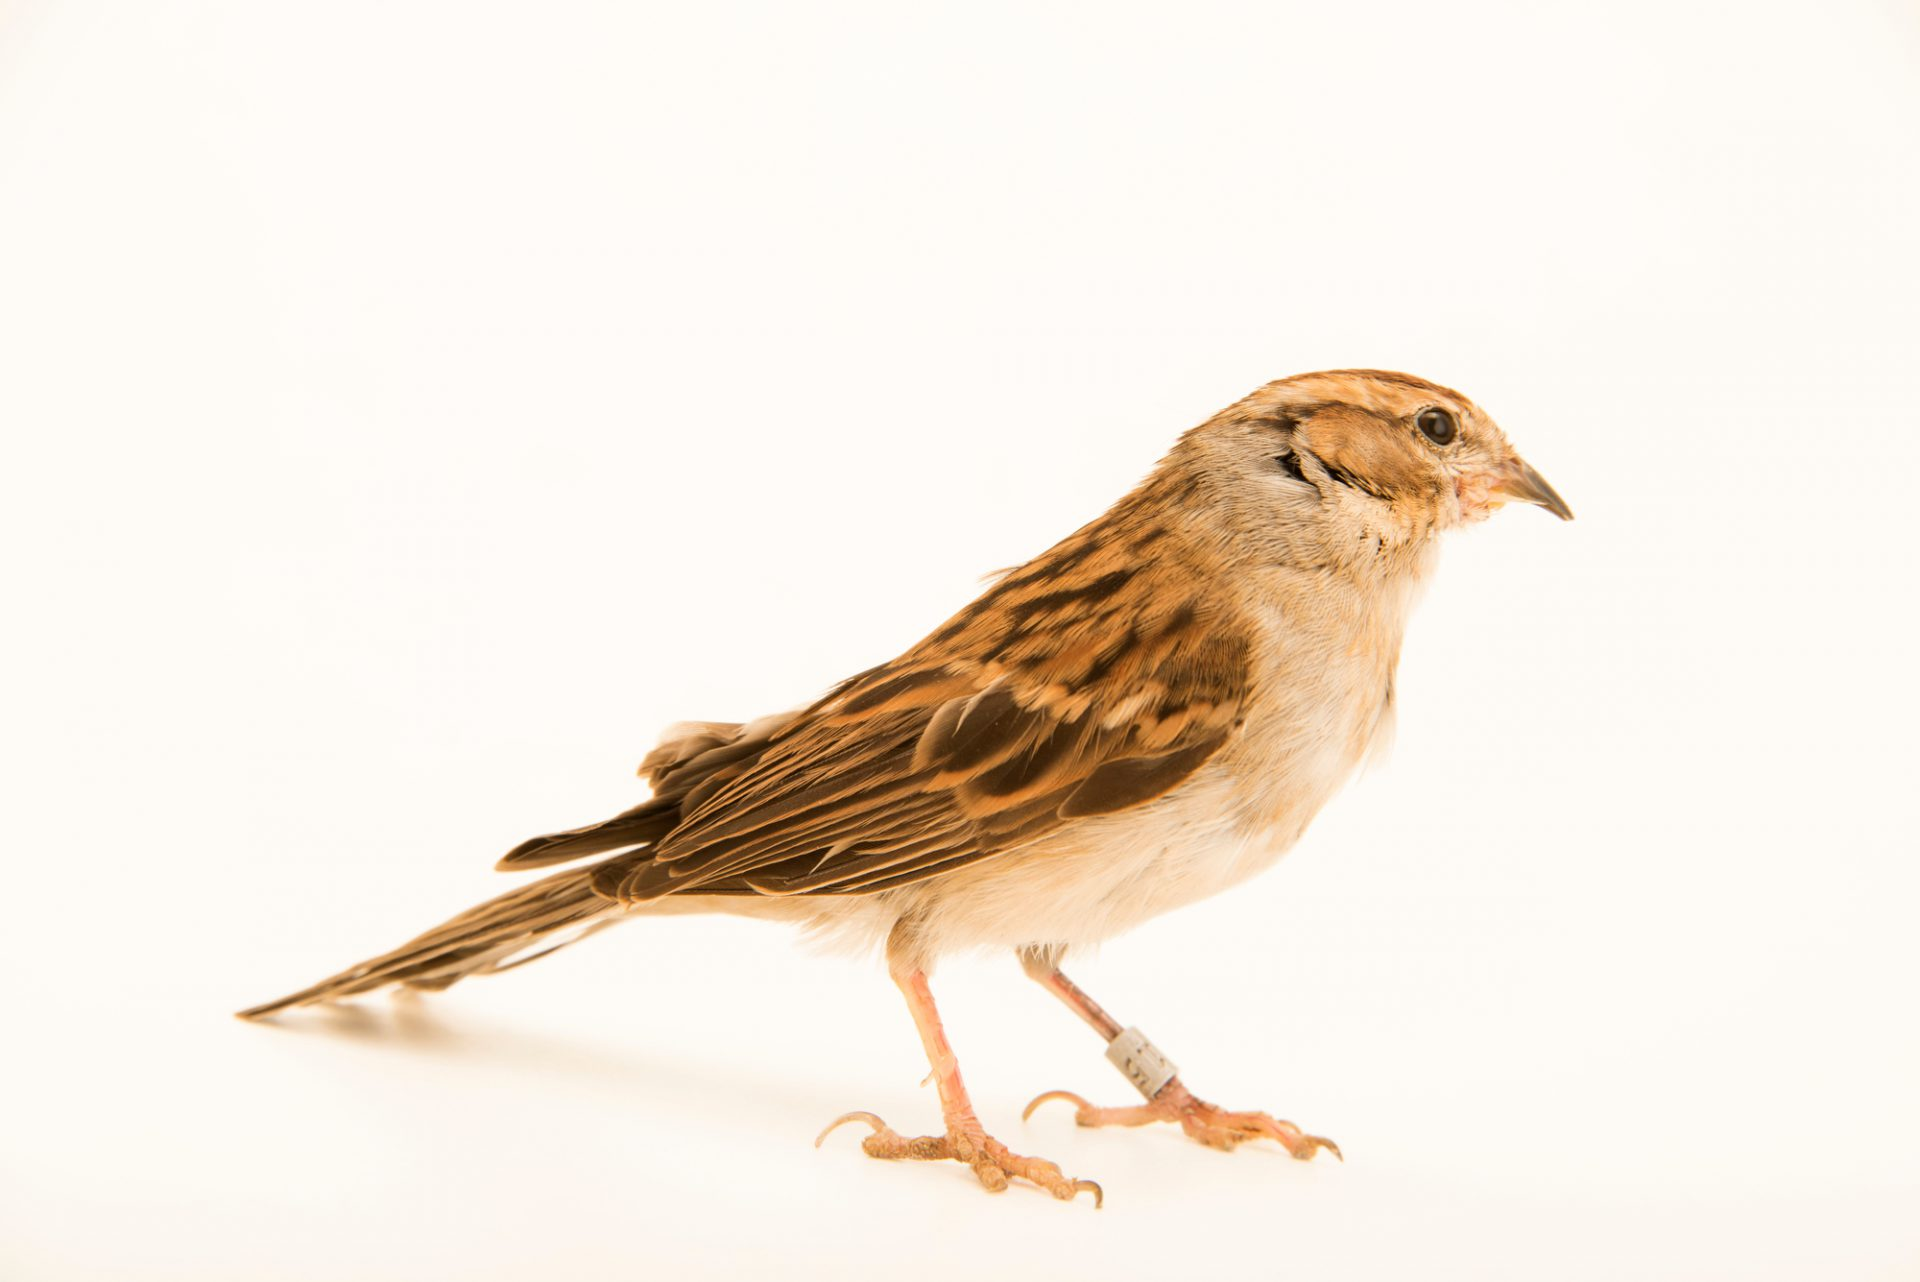 Photo: Chipping sparrow (Spizella passerina) at Bay Beach Wildlife Sanctuary